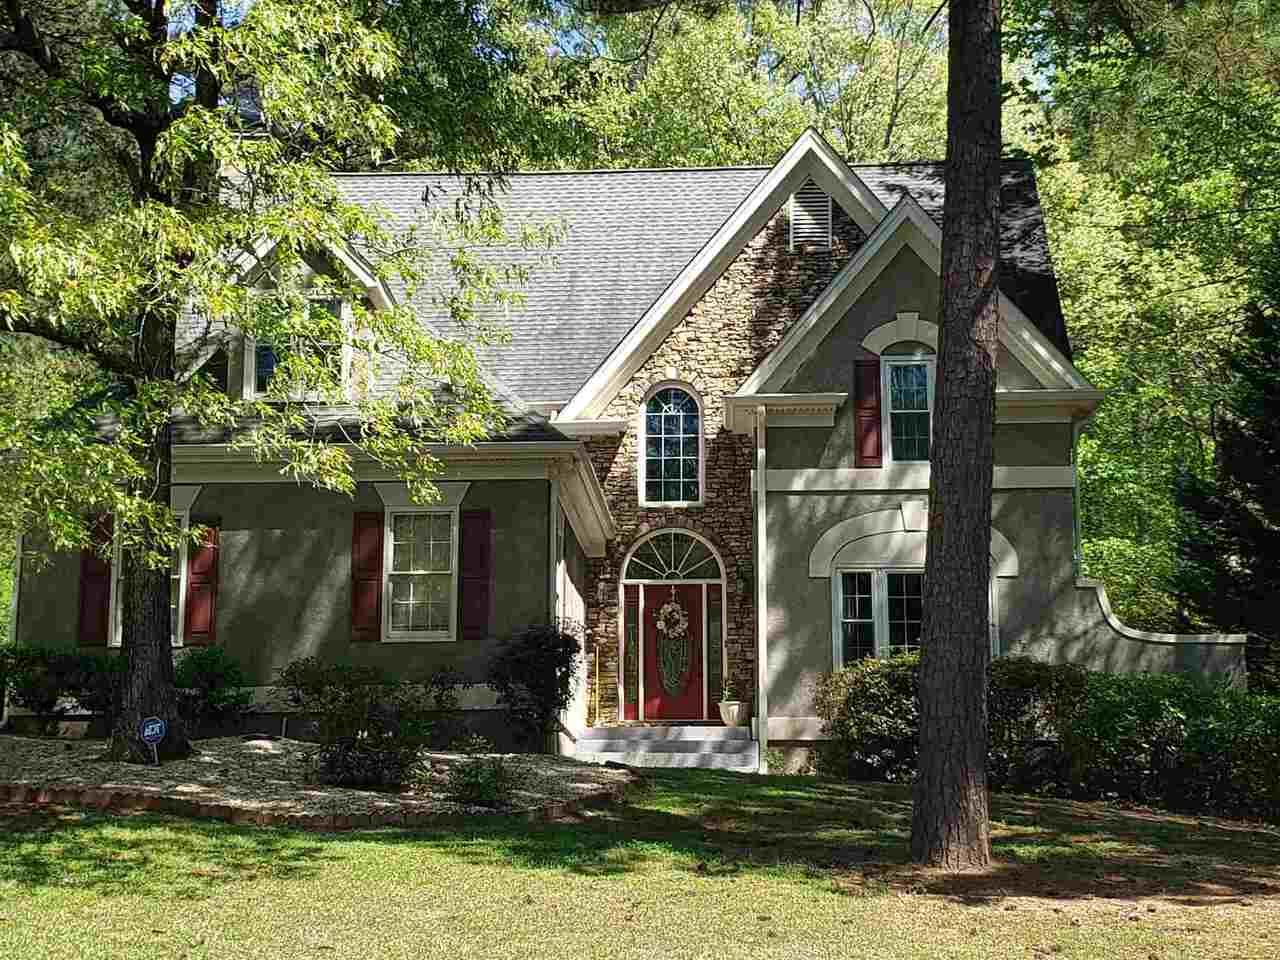 9370 Sweetbriar Trce, Jonesboro, GA 30236 - #: 8965567